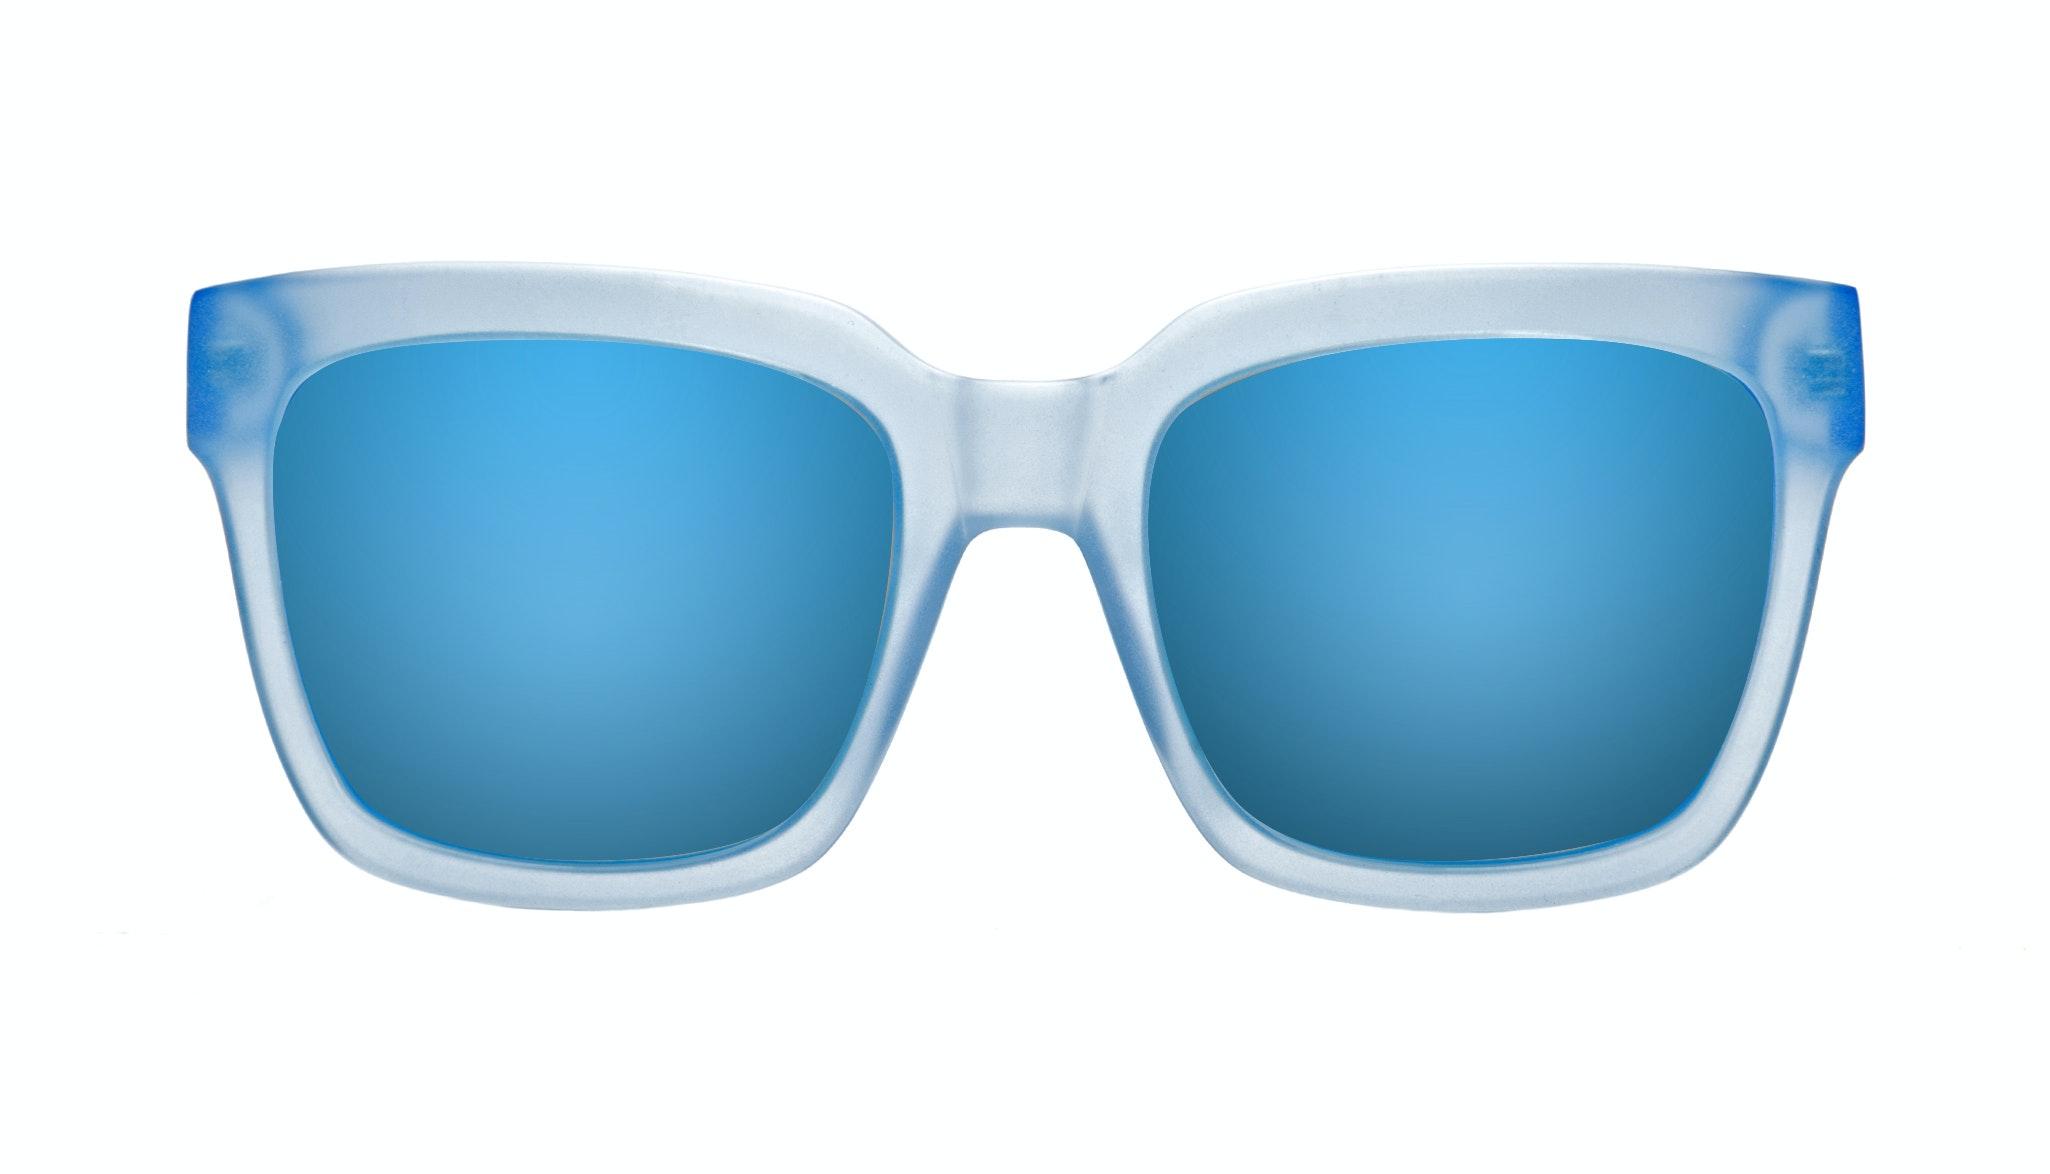 Affordable Fashion Glasses Rectangle Sunglasses Women UpBeat Blue